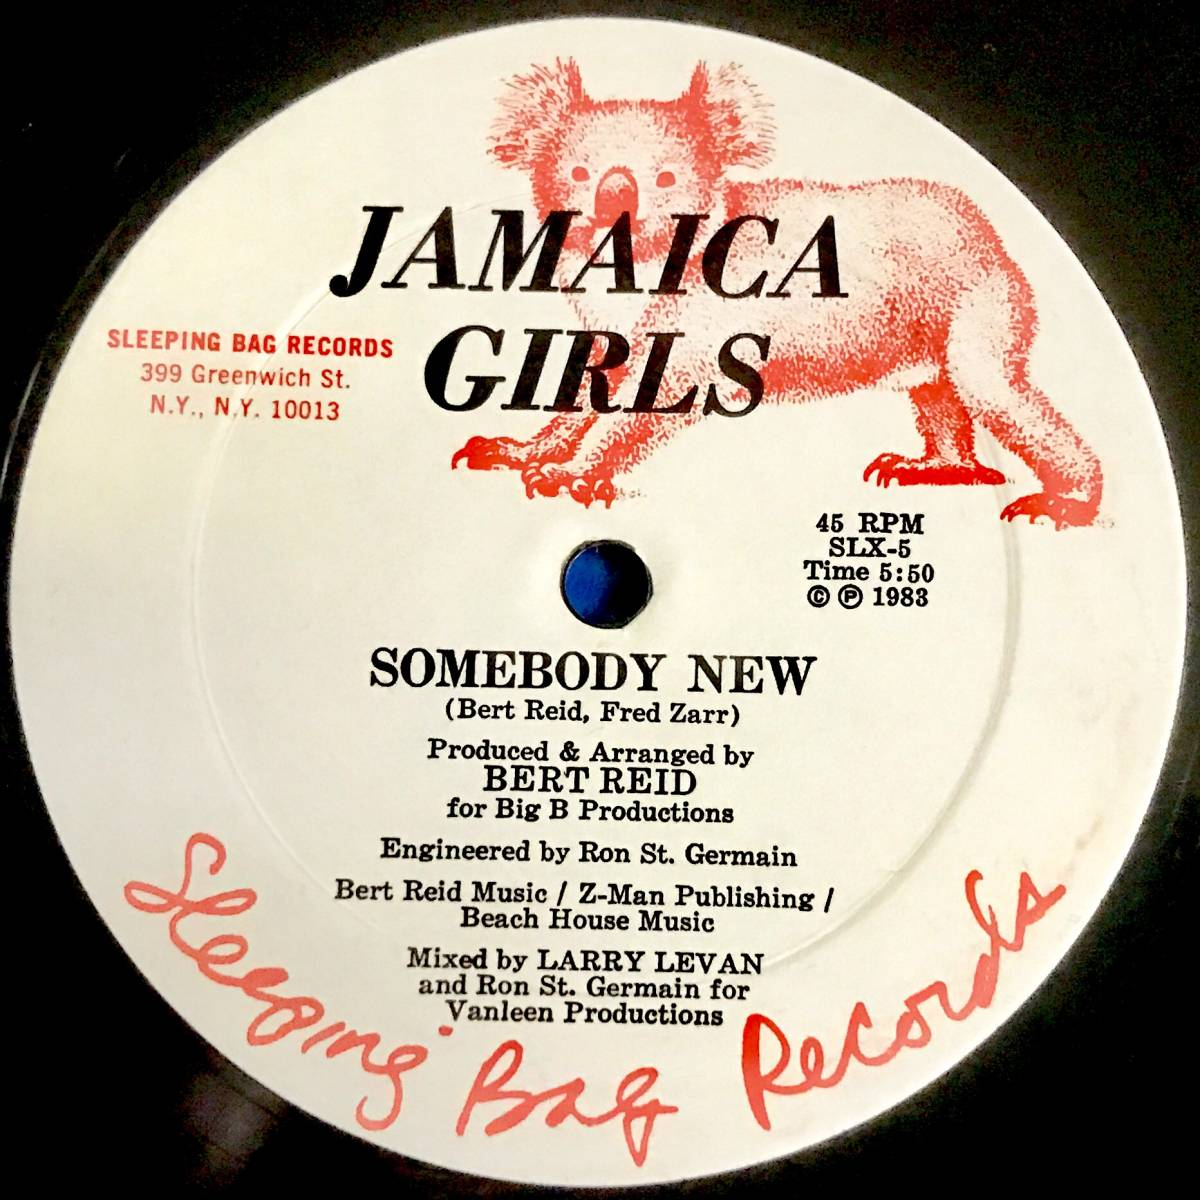 【DISCO】JAMAICA GIRLS//NEED SOMEBODY NEW//12INCH VINYL/US/LARRY LEVAN/LOFT/GARAGE_画像2